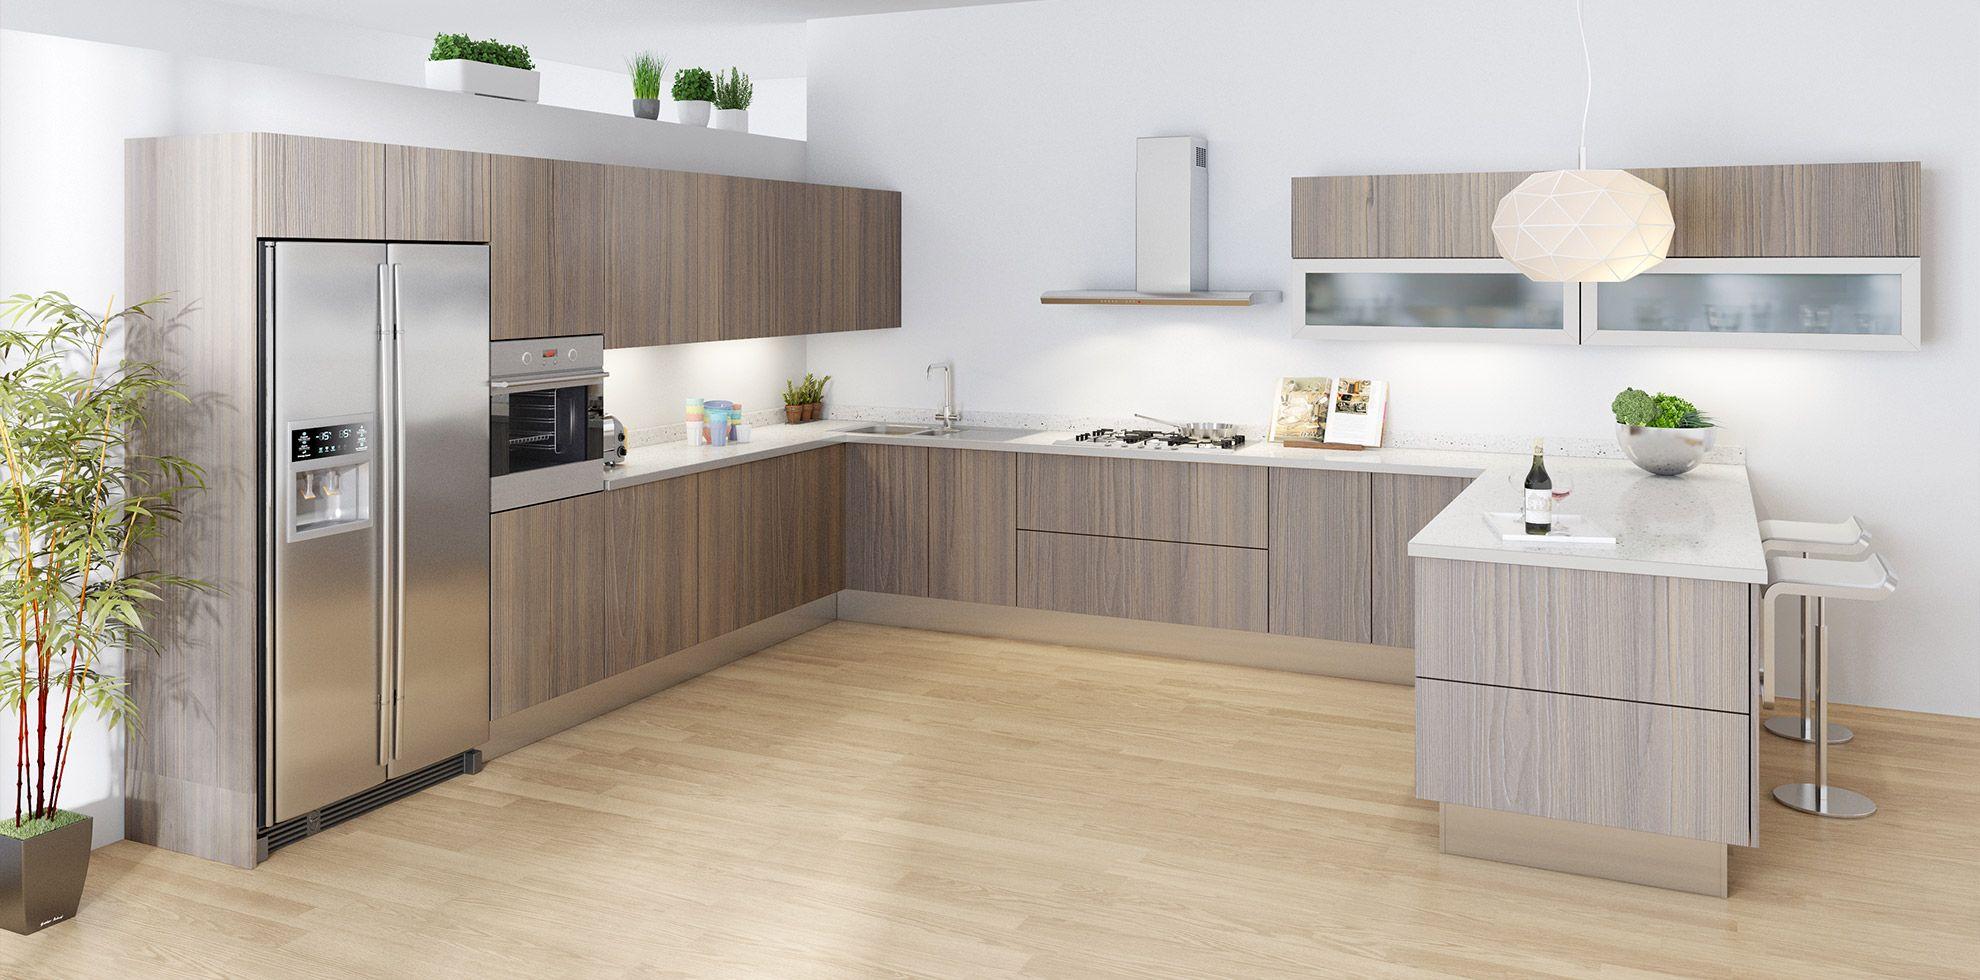 Esperia Dublin Modern Door Style Modern Kitchen Renovation Modern Kitchen European Kitchen Cabinets